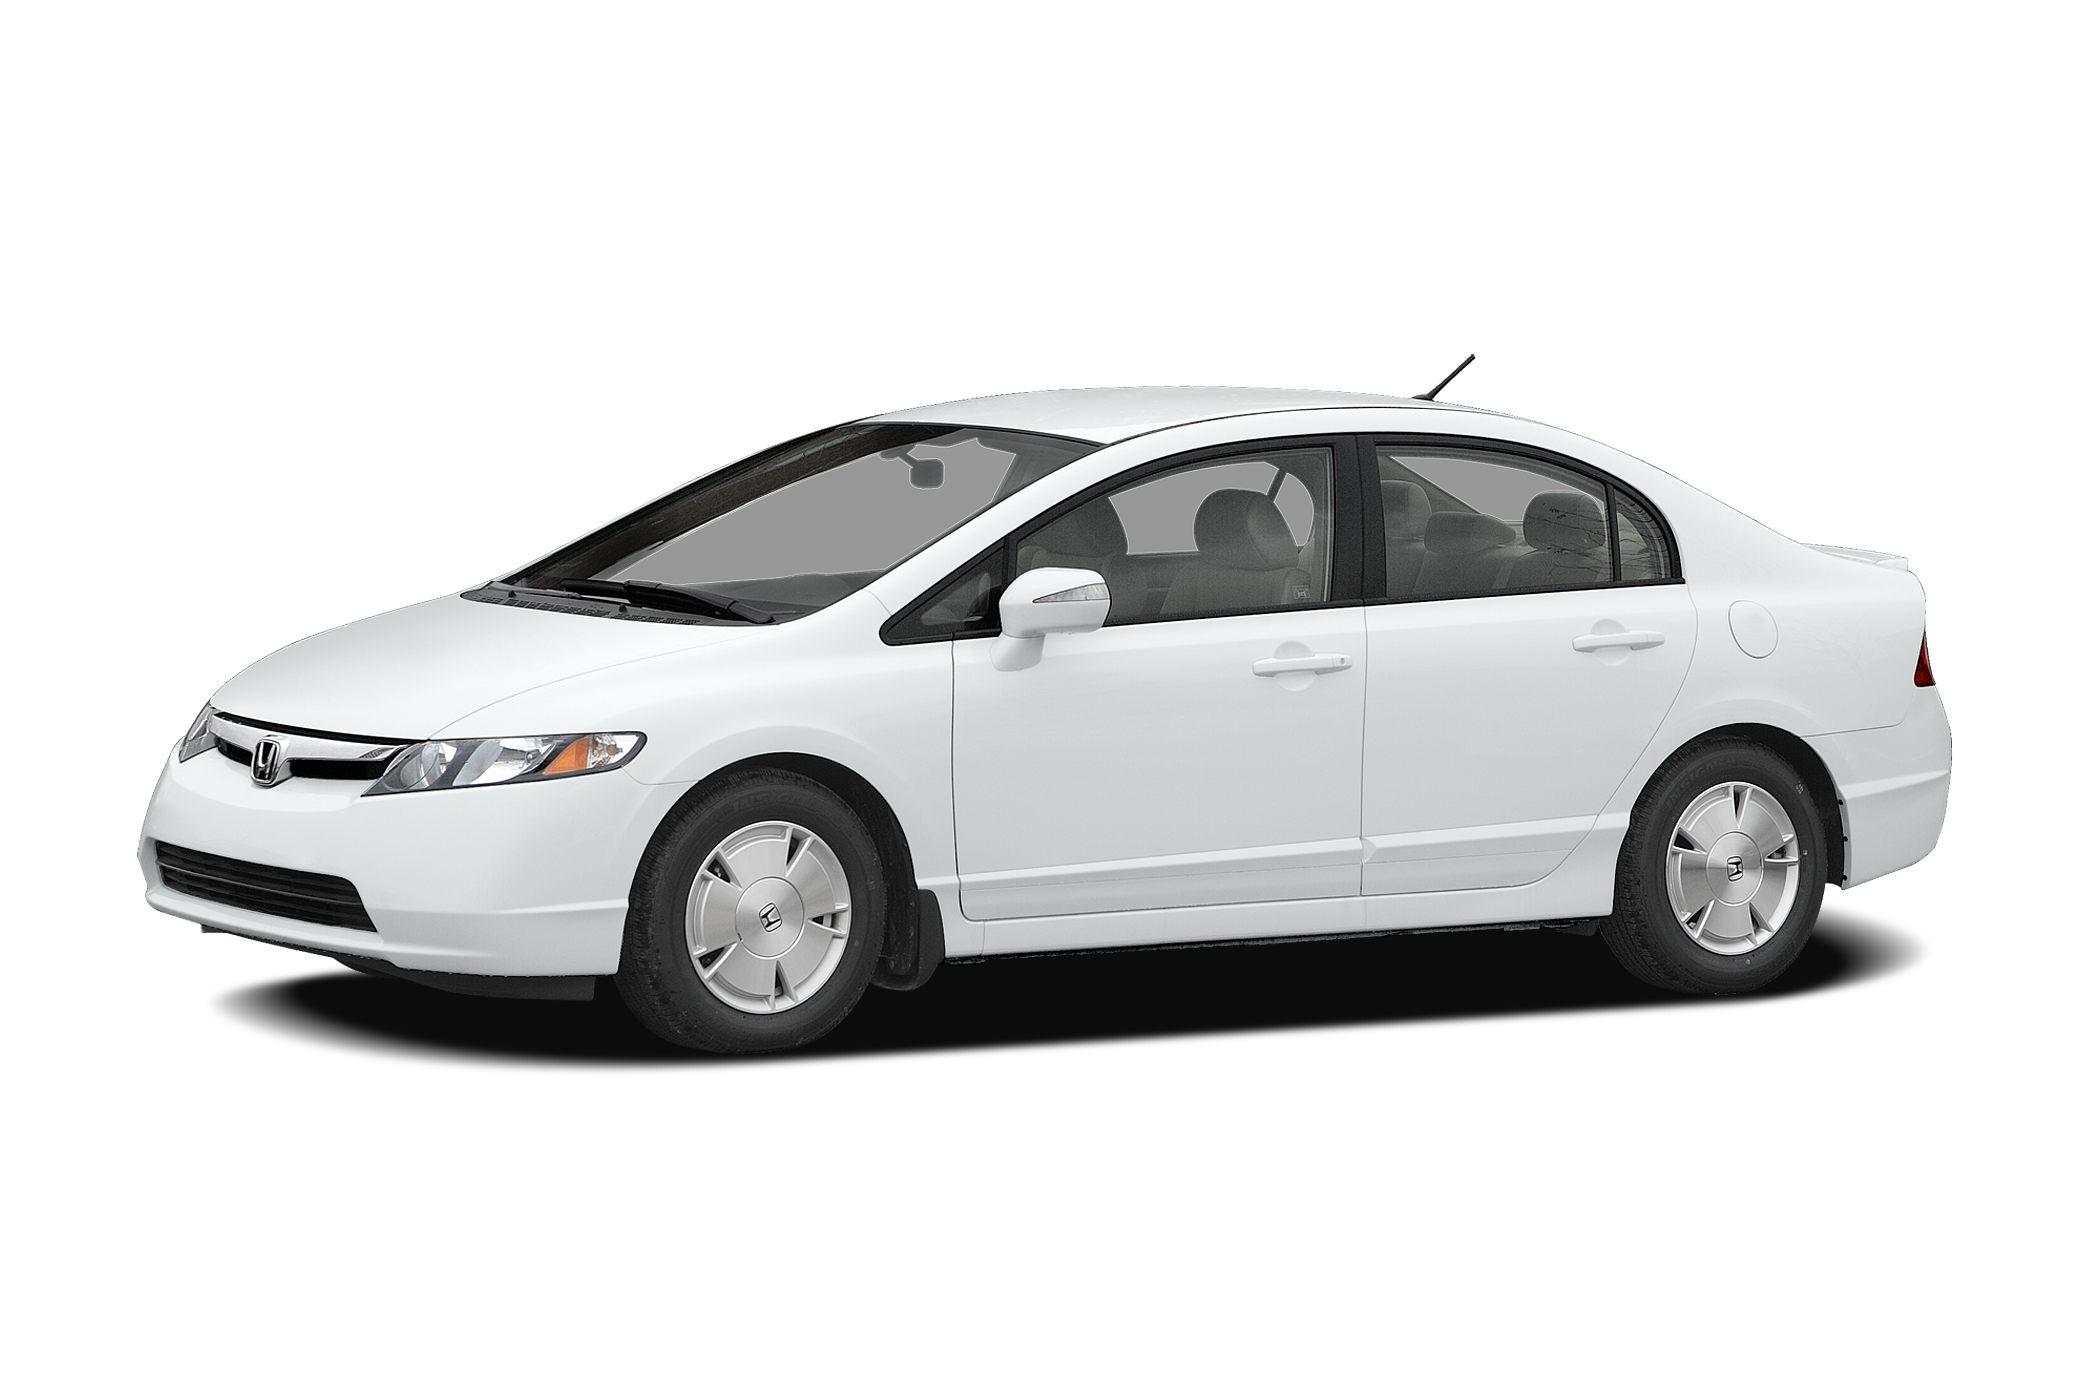 2007 Honda Civic Hybrid Base Miles 153769Color Silver Stock 8556B VIN JHMFA36287S008944